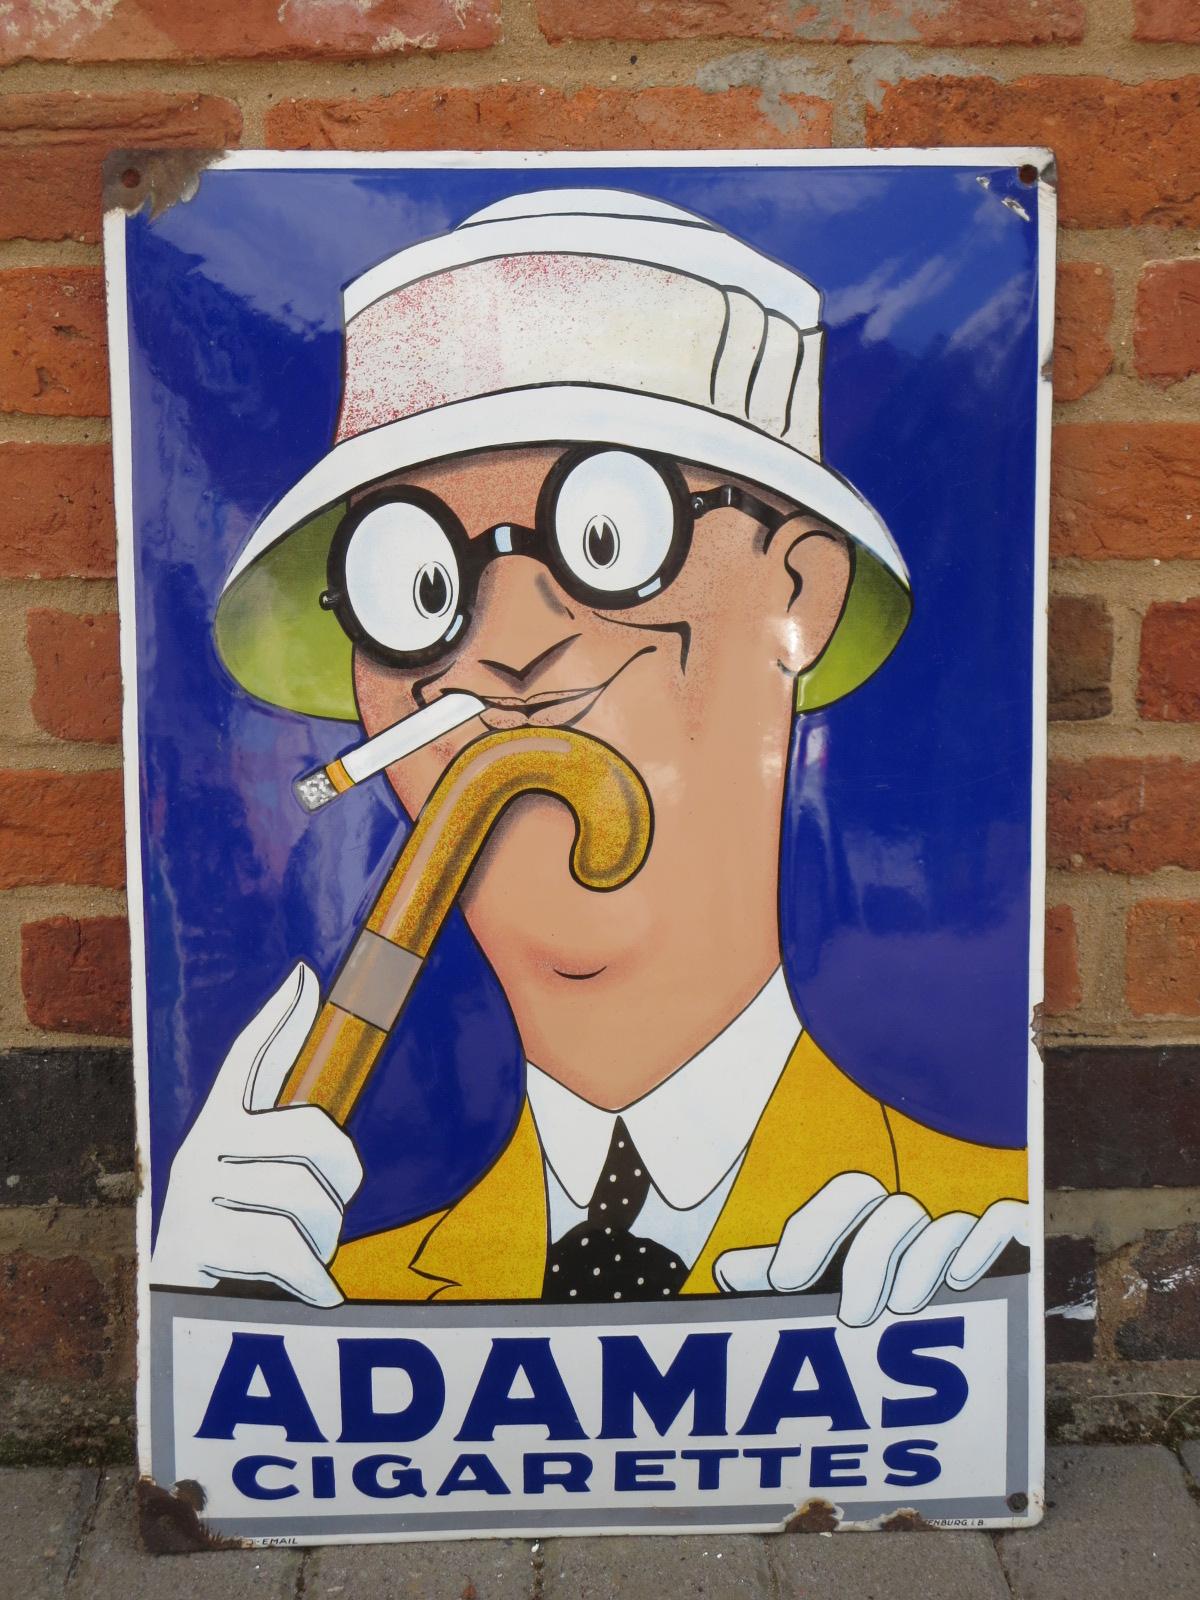 Adamas Cigarettes an enamel sign, adamas cigarettes, 15in x 23in